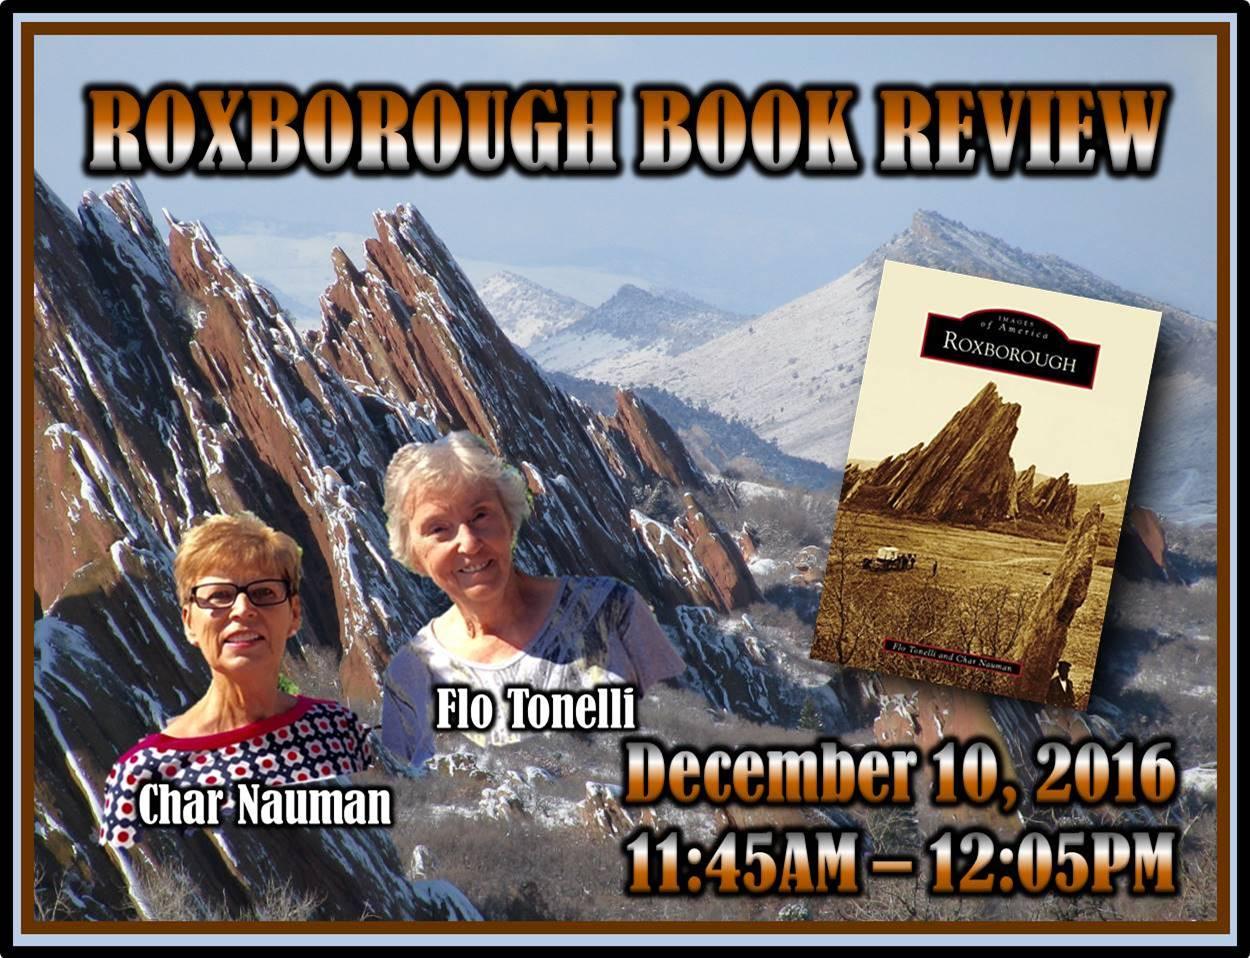 roxborough-book-review